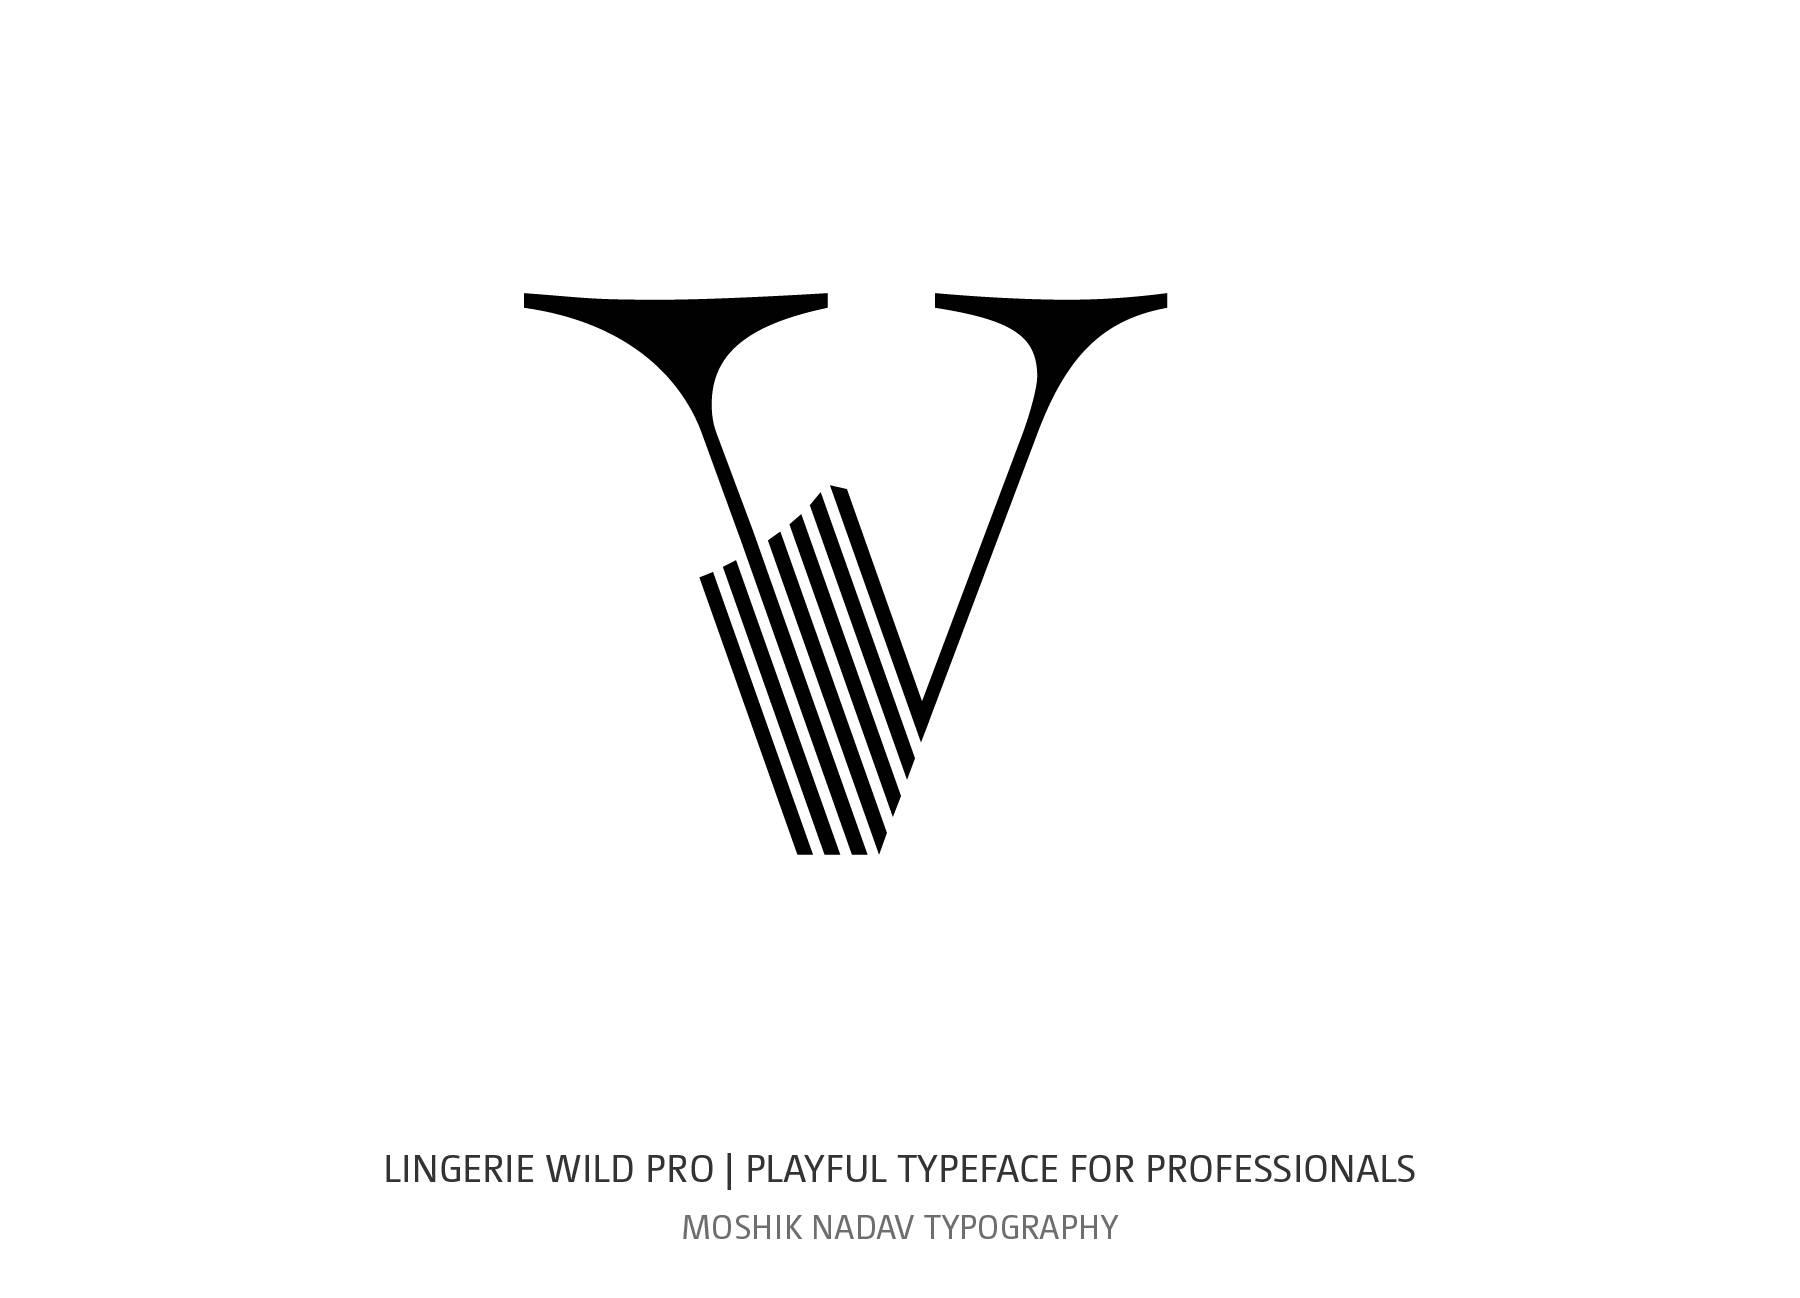 Lingerie Wild Pro Typeface lowercase v by Moshik Nadav Beauty Typography